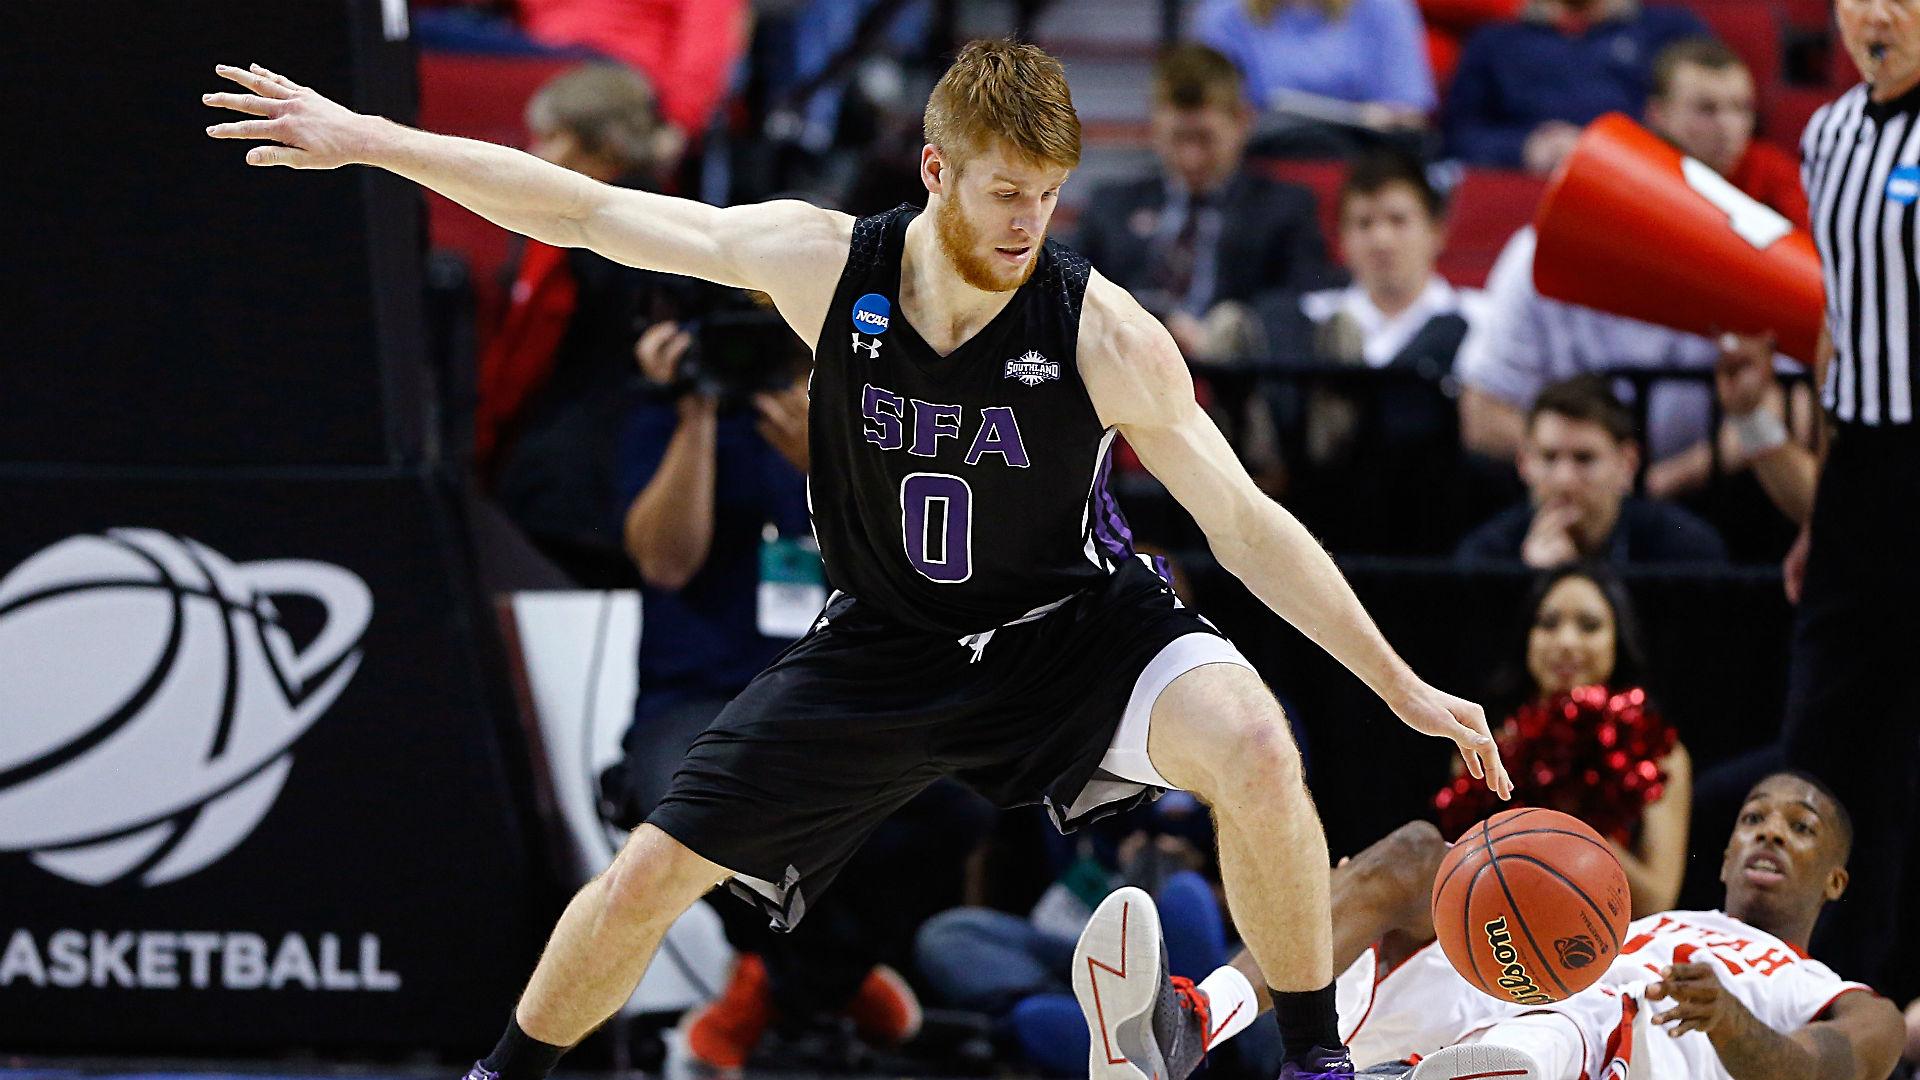 Sfa Basketball Thomas Walkup